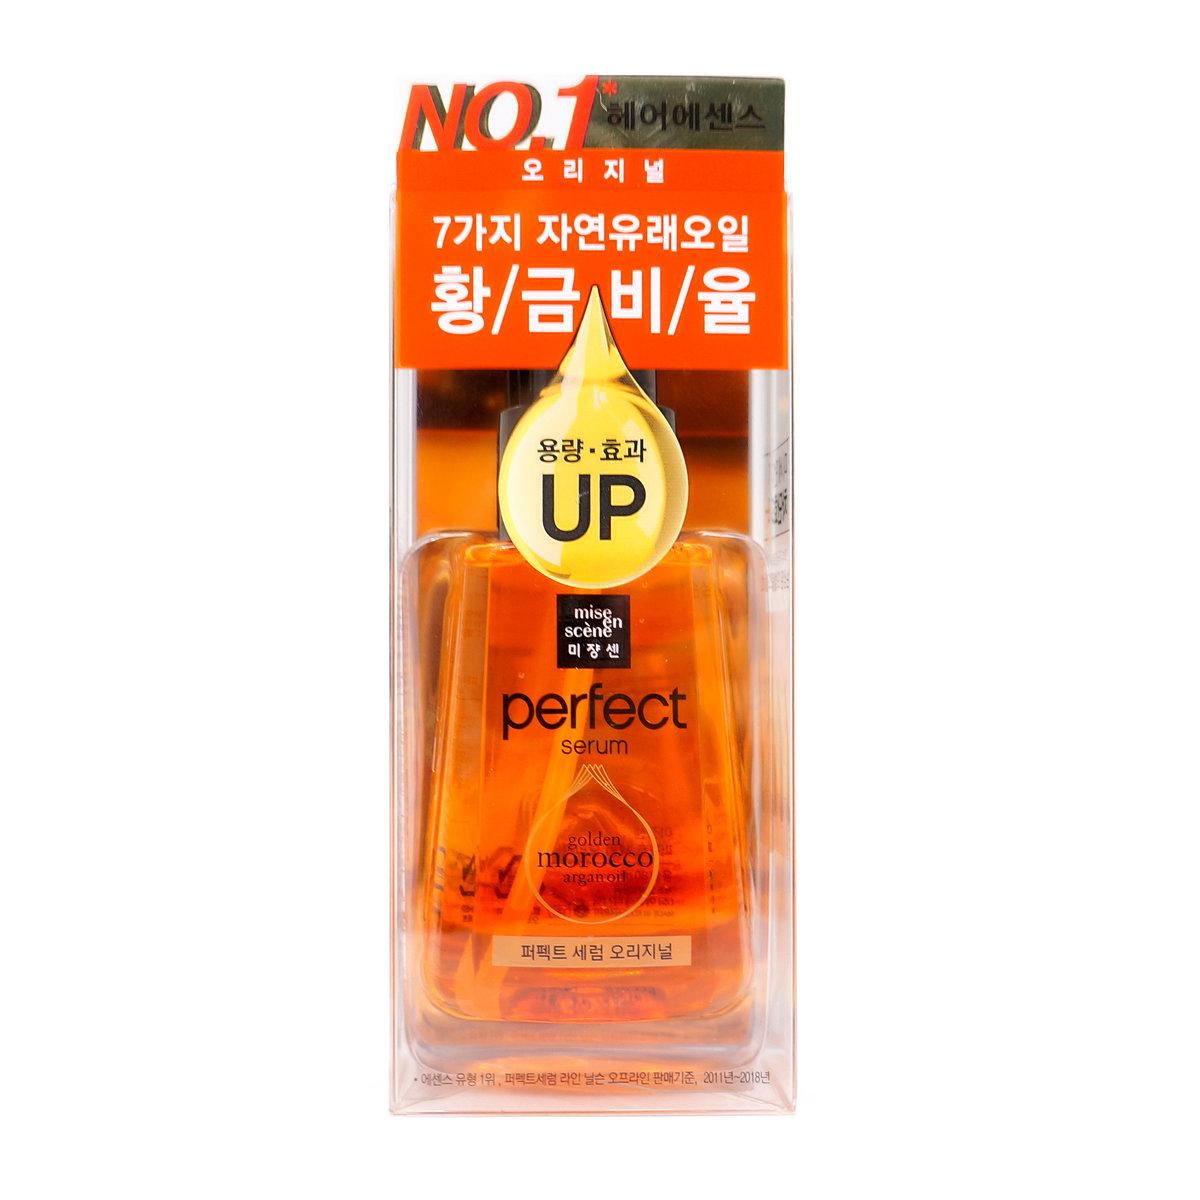 Perfect Serum Rose essence hair oil 2020ver 80ml (8809643062121)